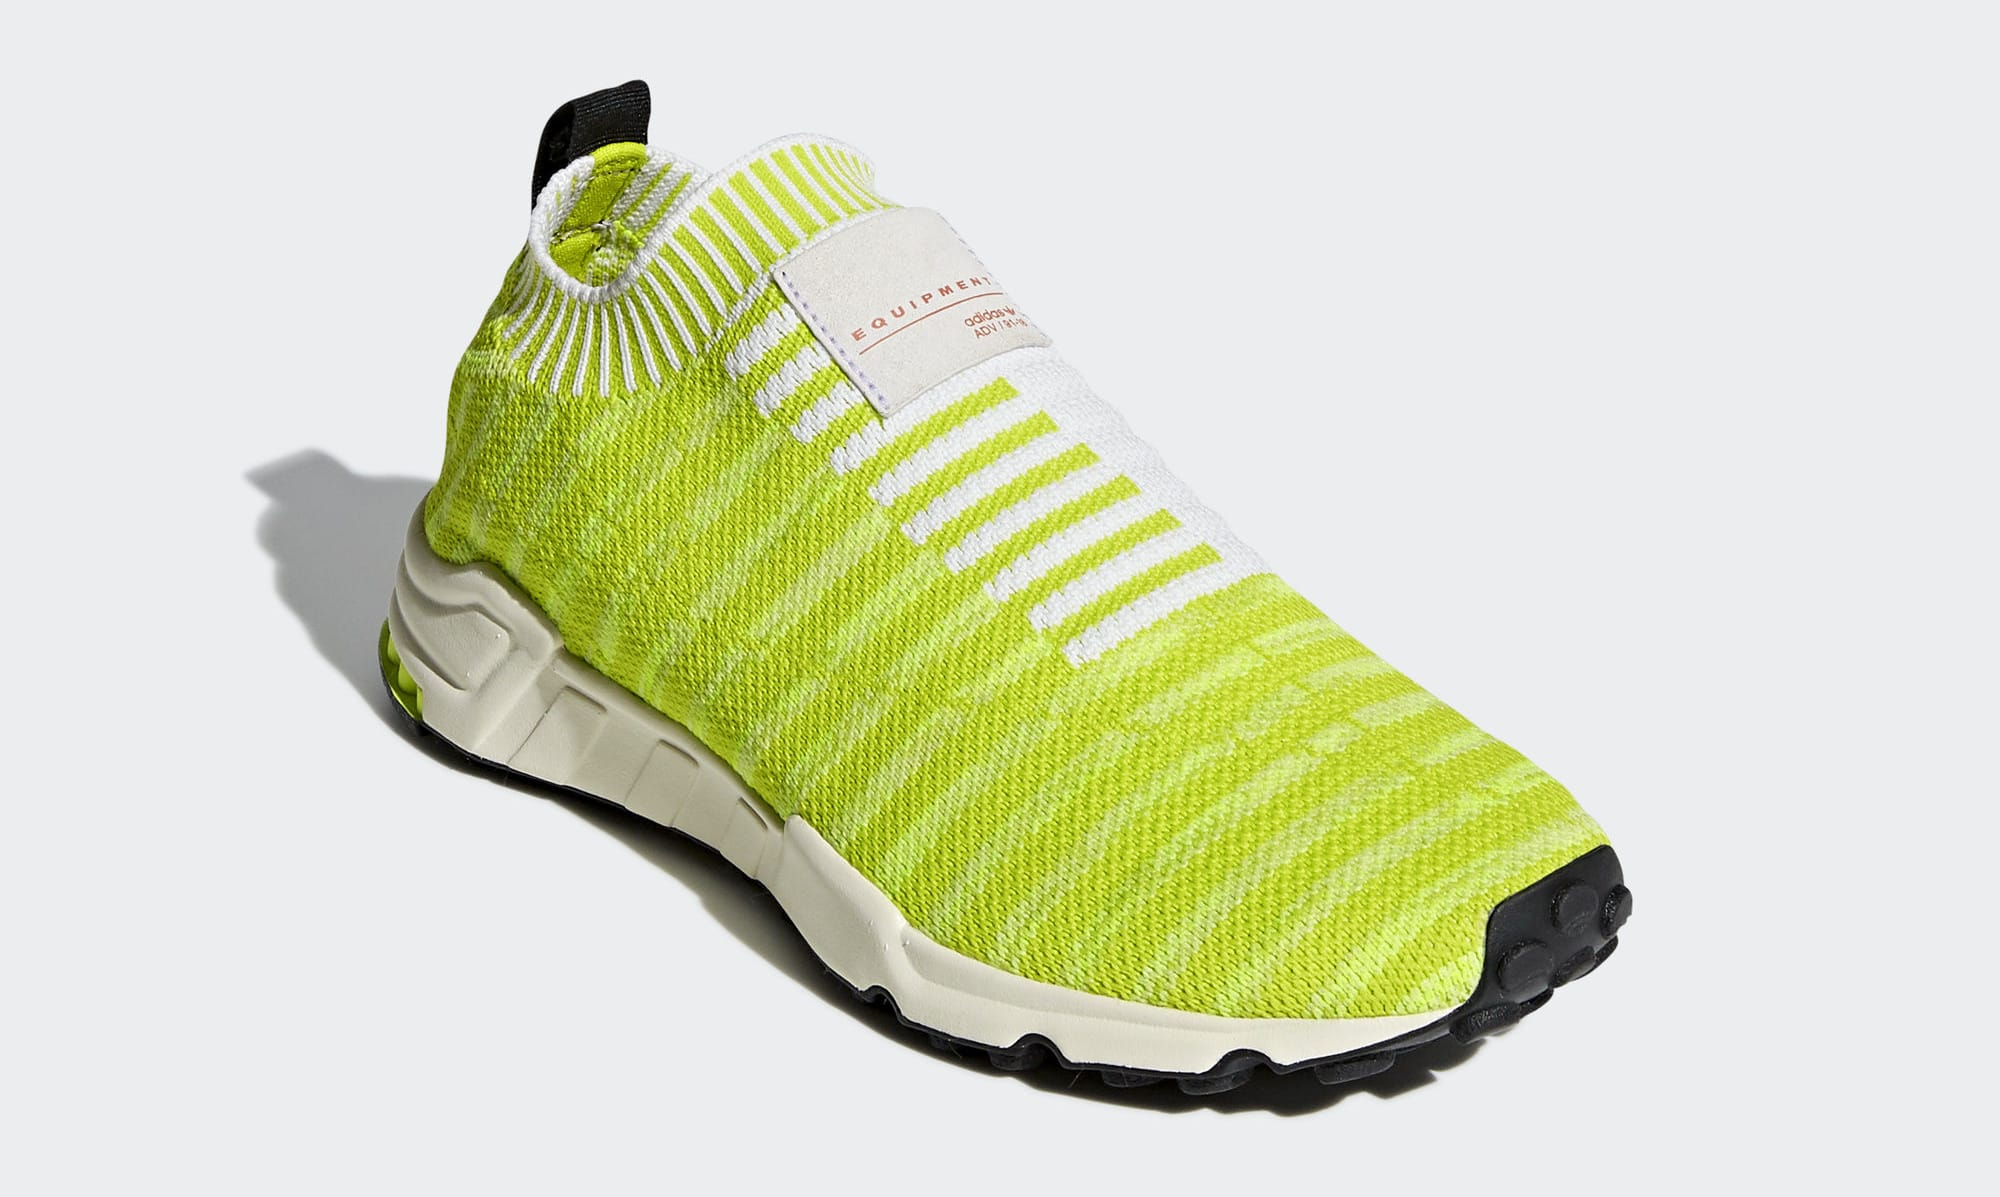 Adidas EQT Support Sock PK 'Solar Yellow' B37545 (Toe)